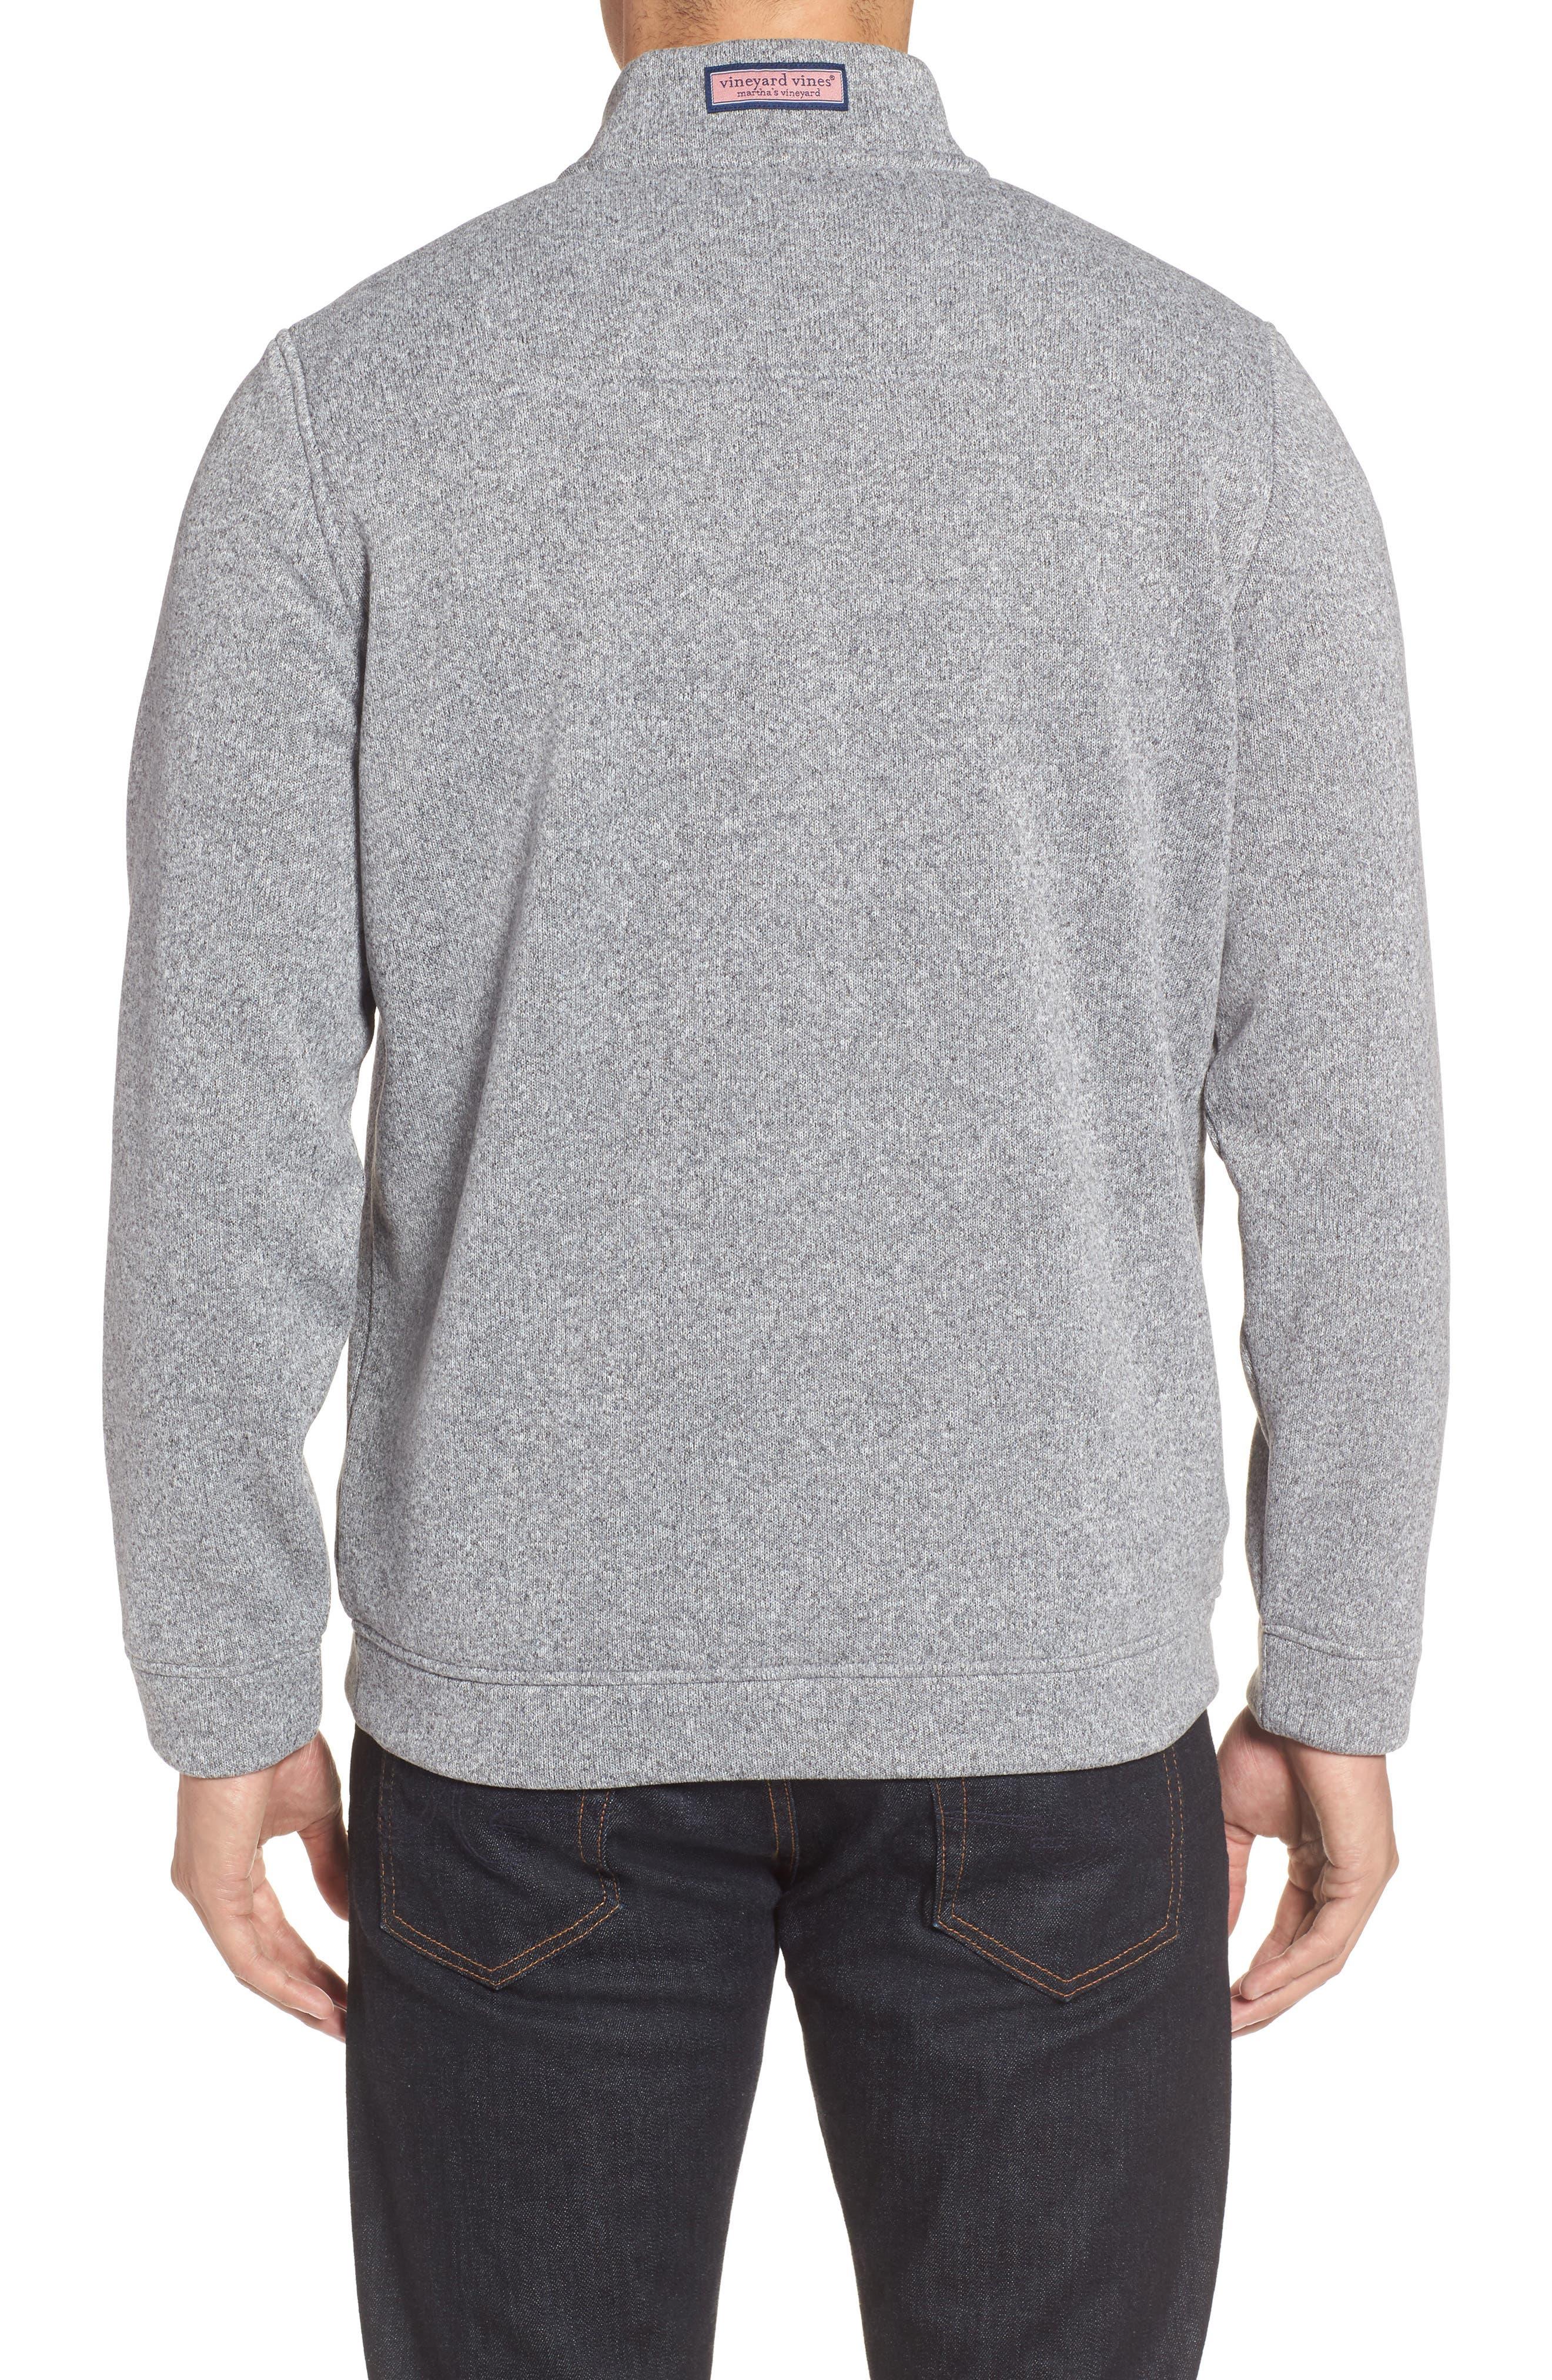 Alternate Image 2  - vineyard vines Shep Sweater Fleece Quarter Zip Pullover